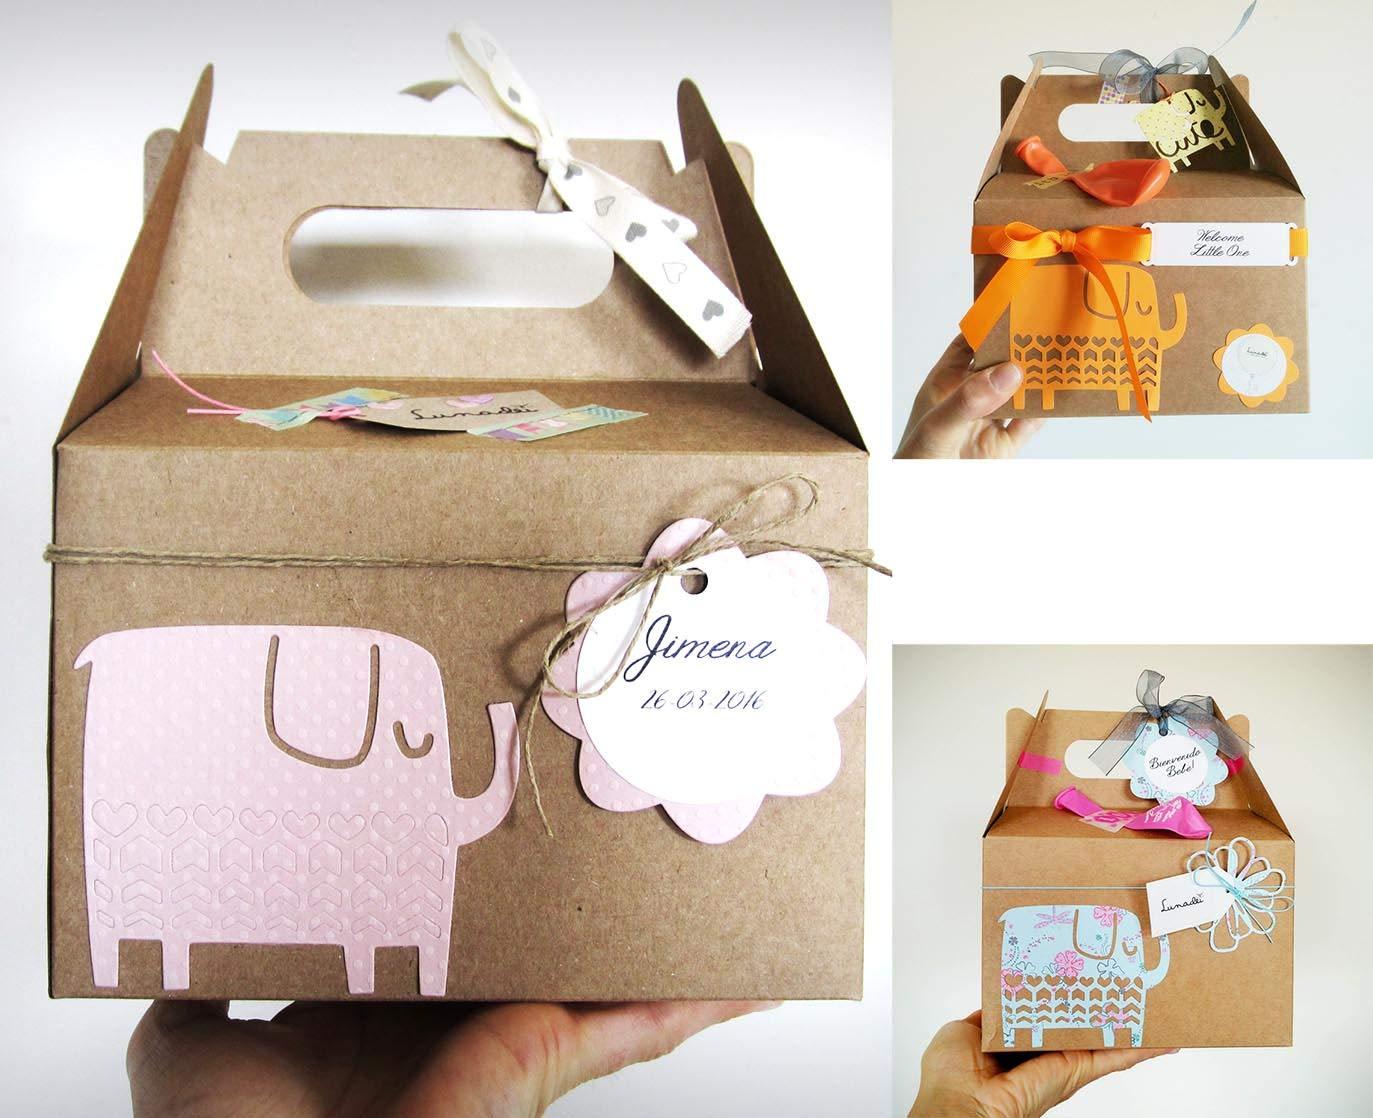 12 meses 4 pares de citas lindas en caja de regalo /Único regalo de baby shower o reci/én nacido Juego de calcetines para beb/é varios